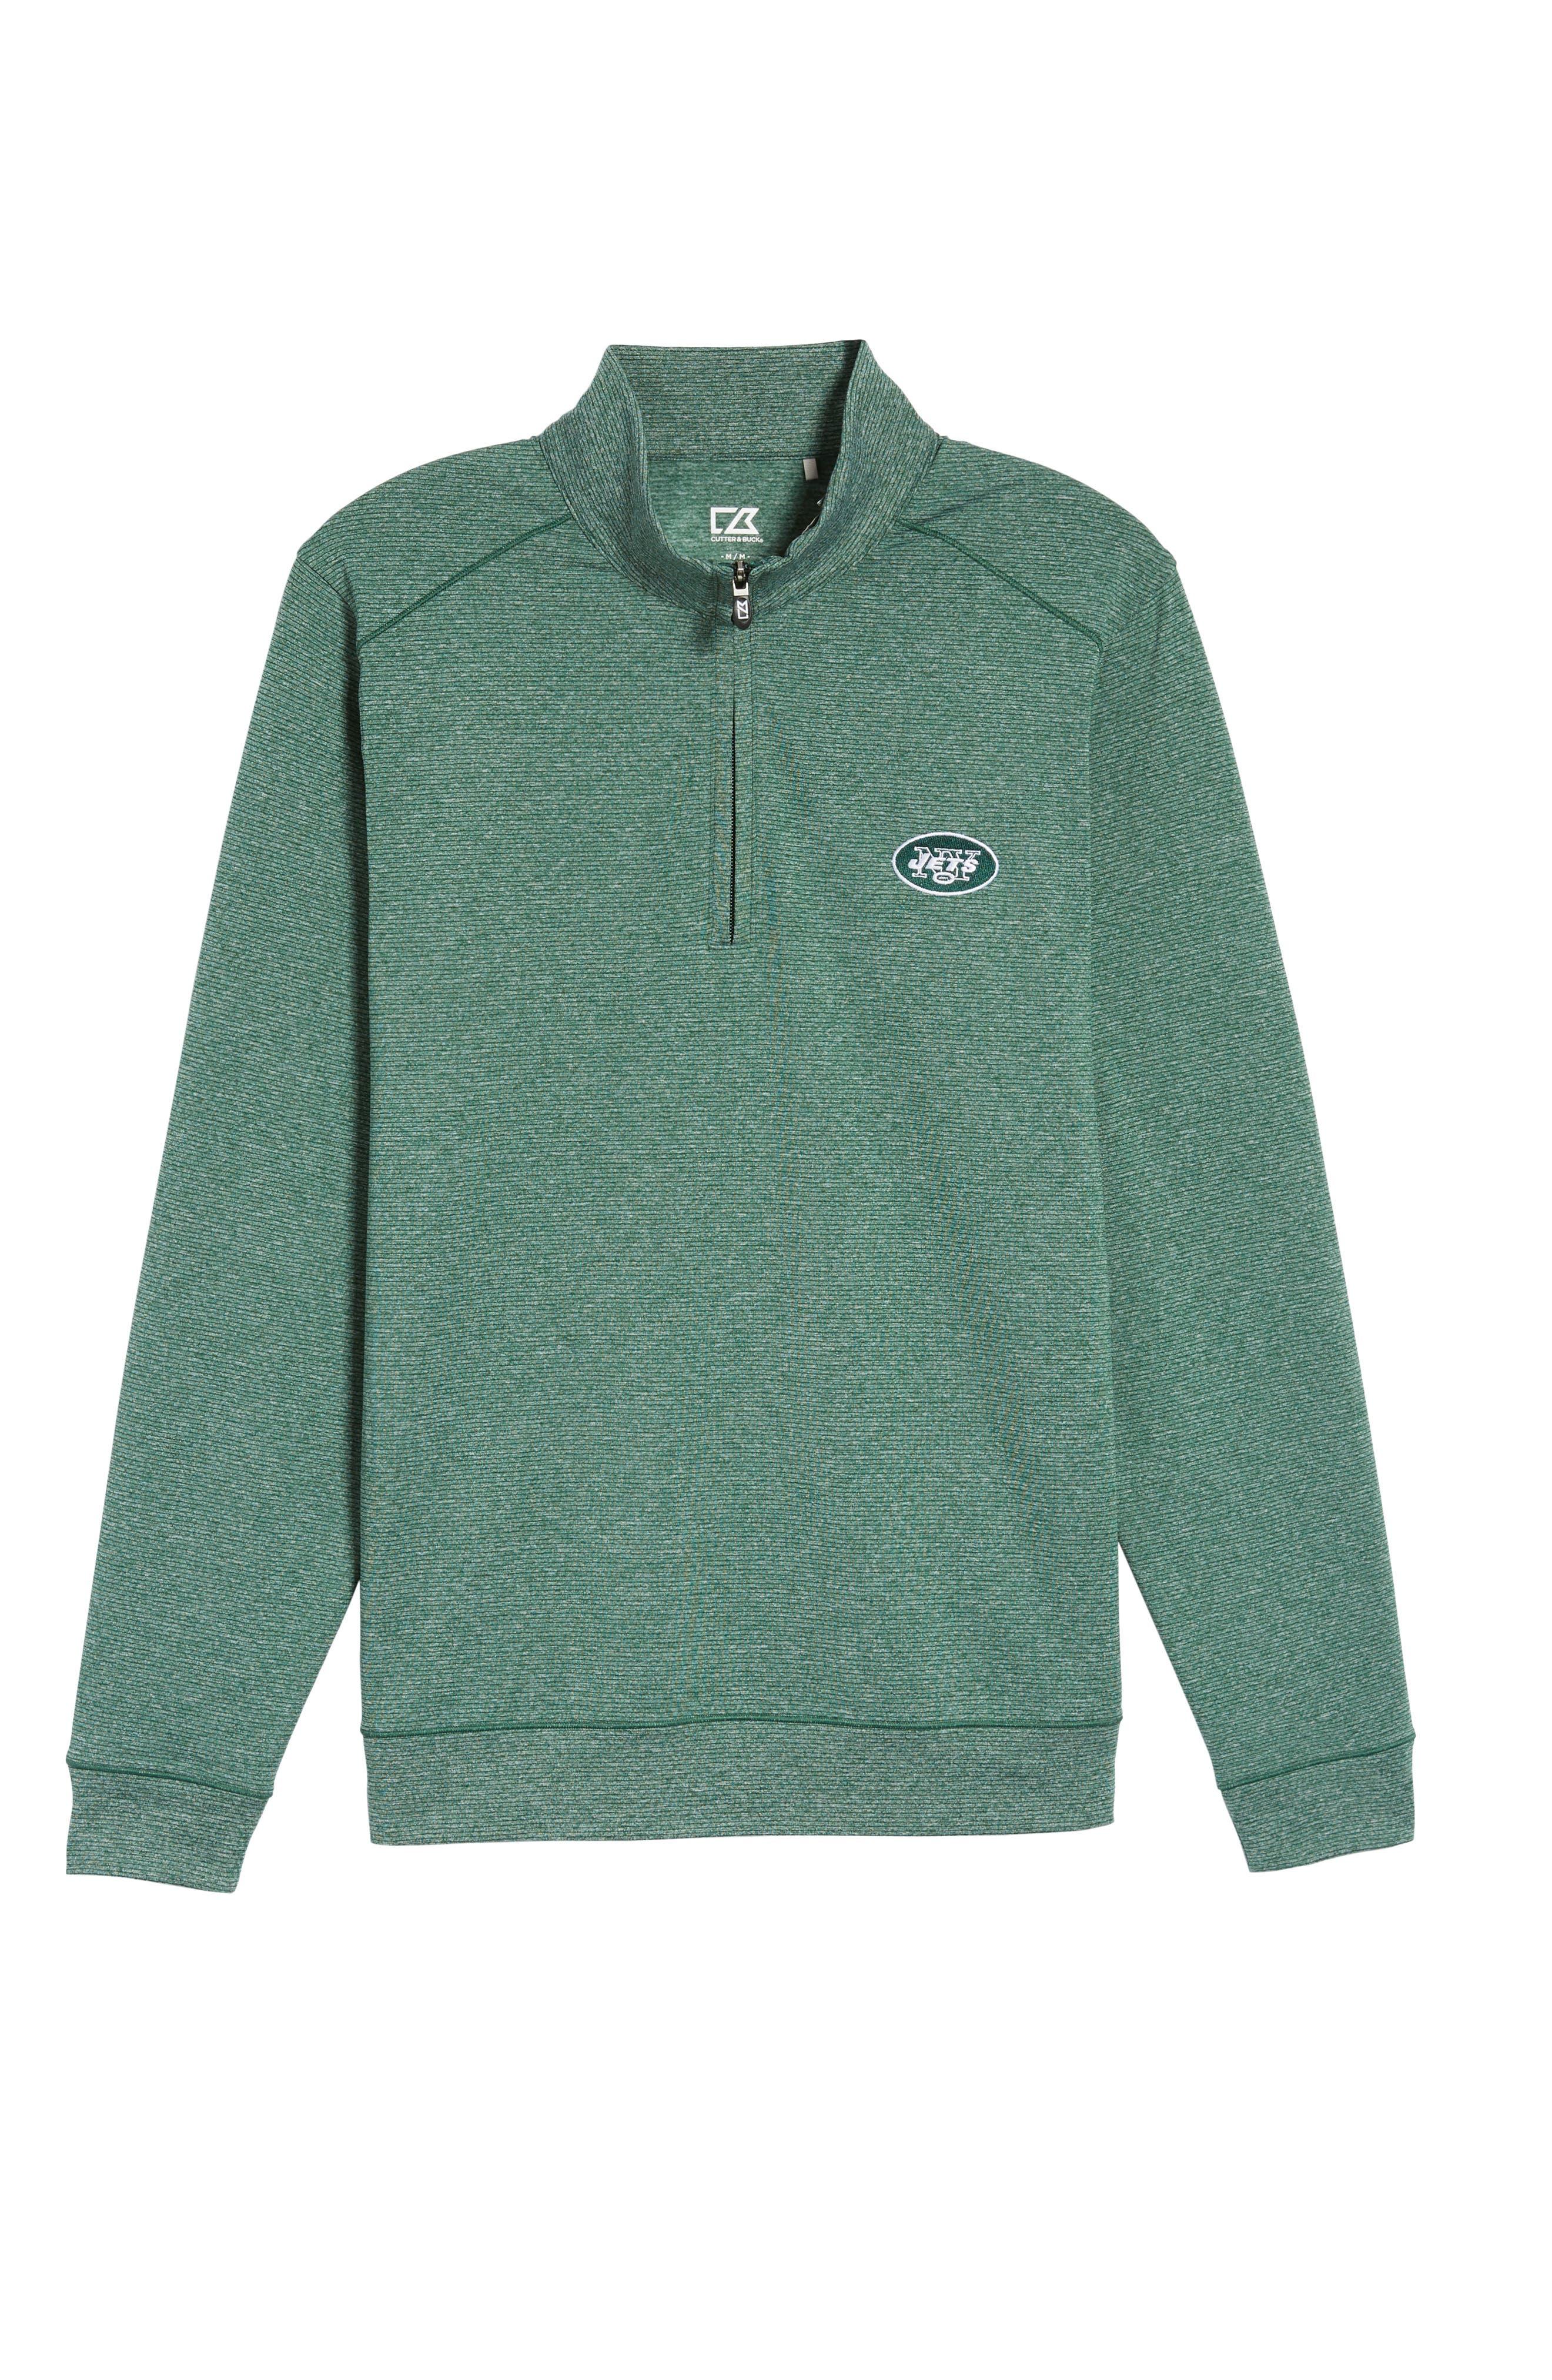 Shoreline - New York Jets Half Zip Pullover,                             Alternate thumbnail 6, color,                             Hunter Heather